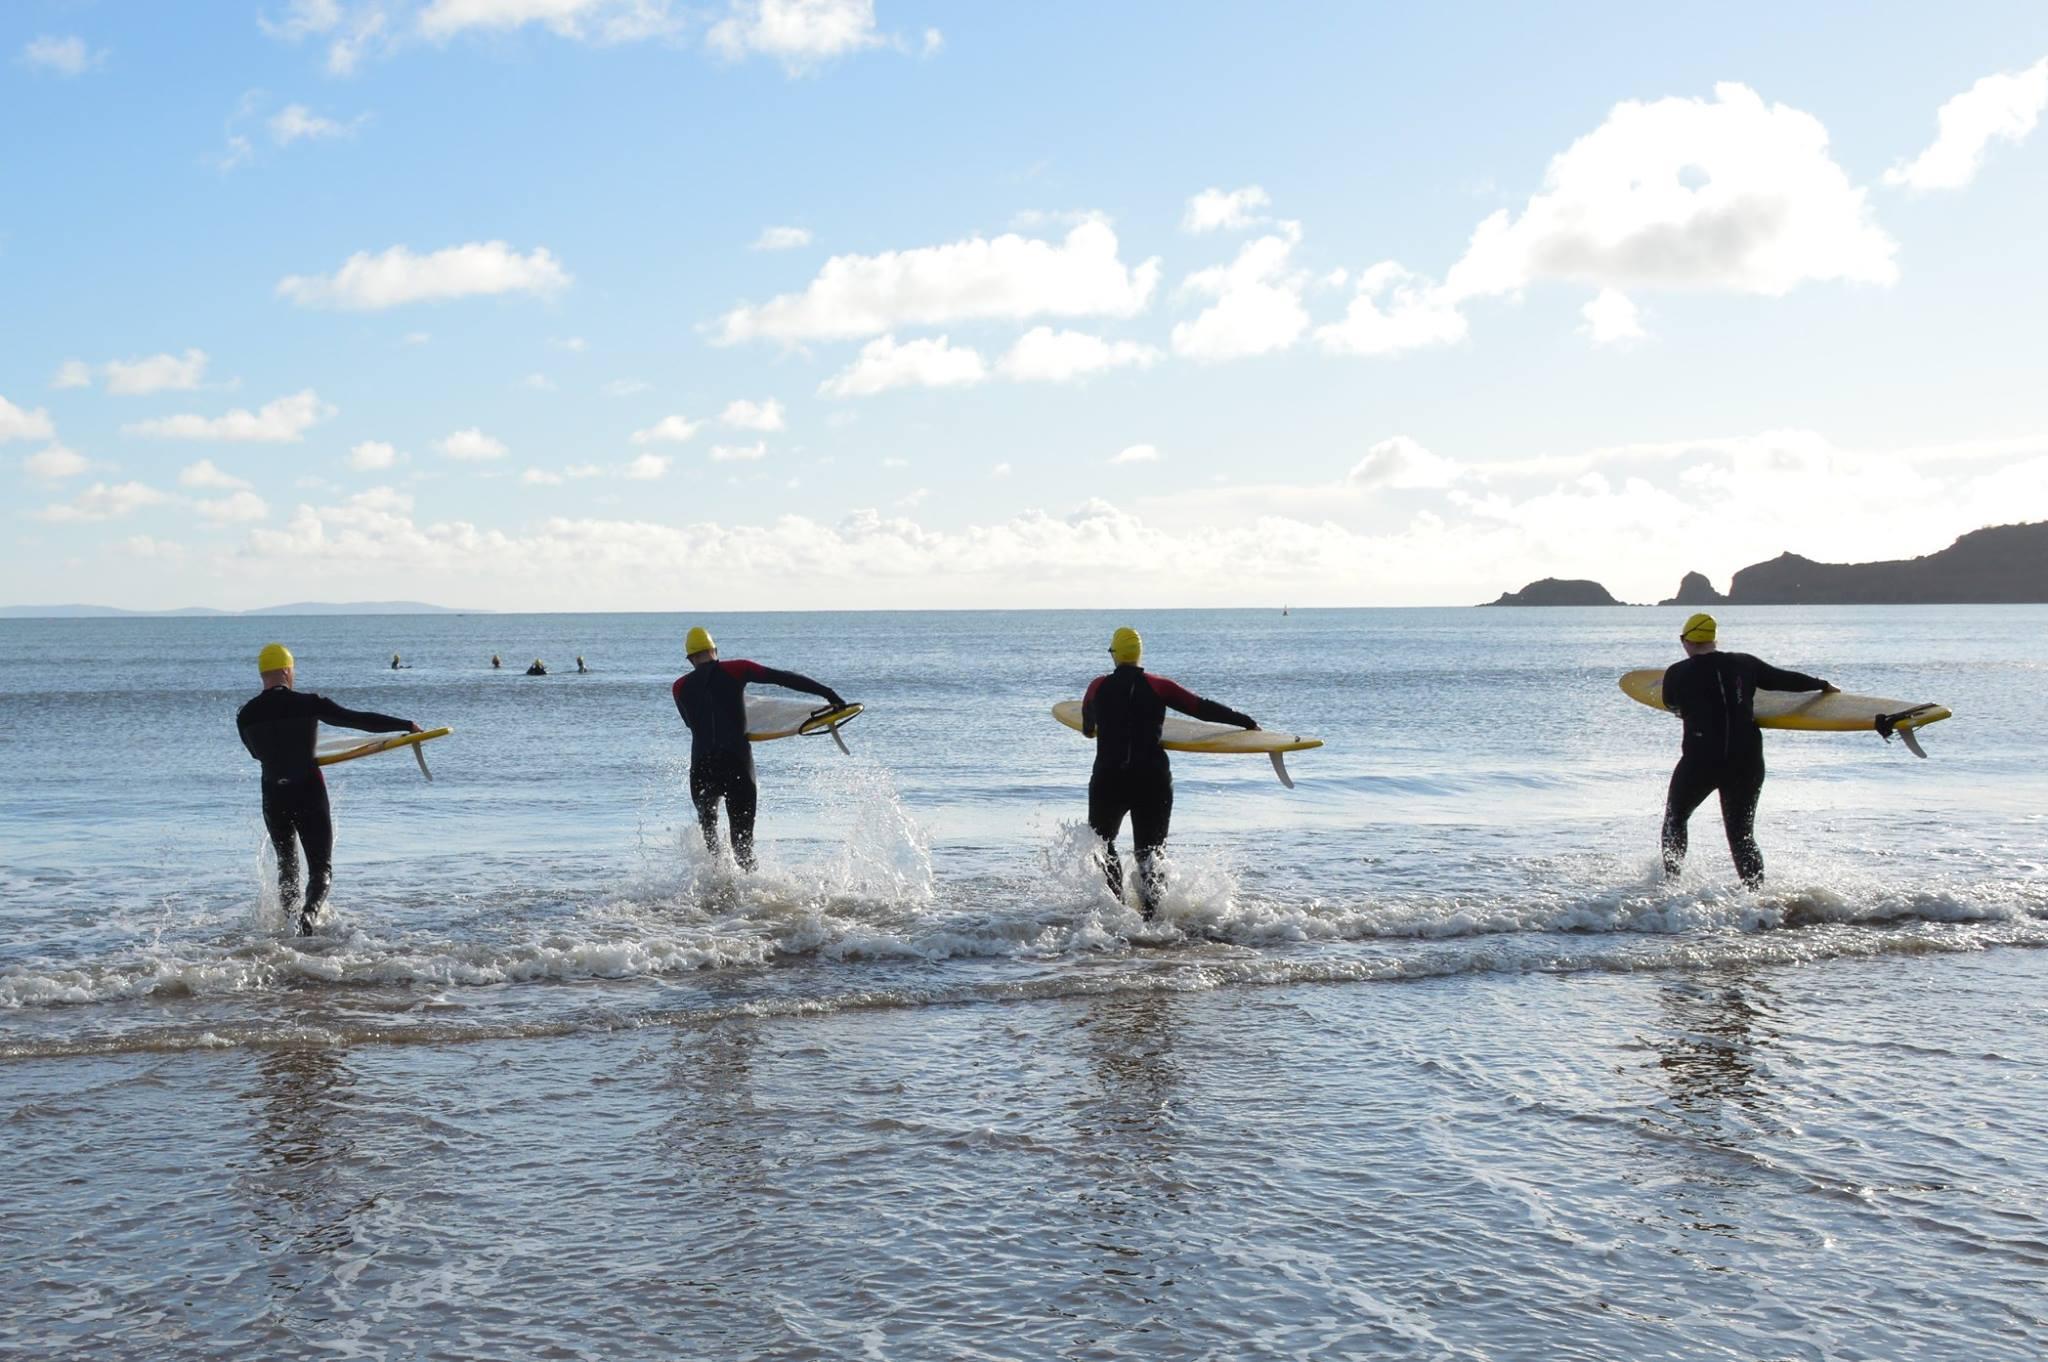 Beach lifeguard training - January 2019